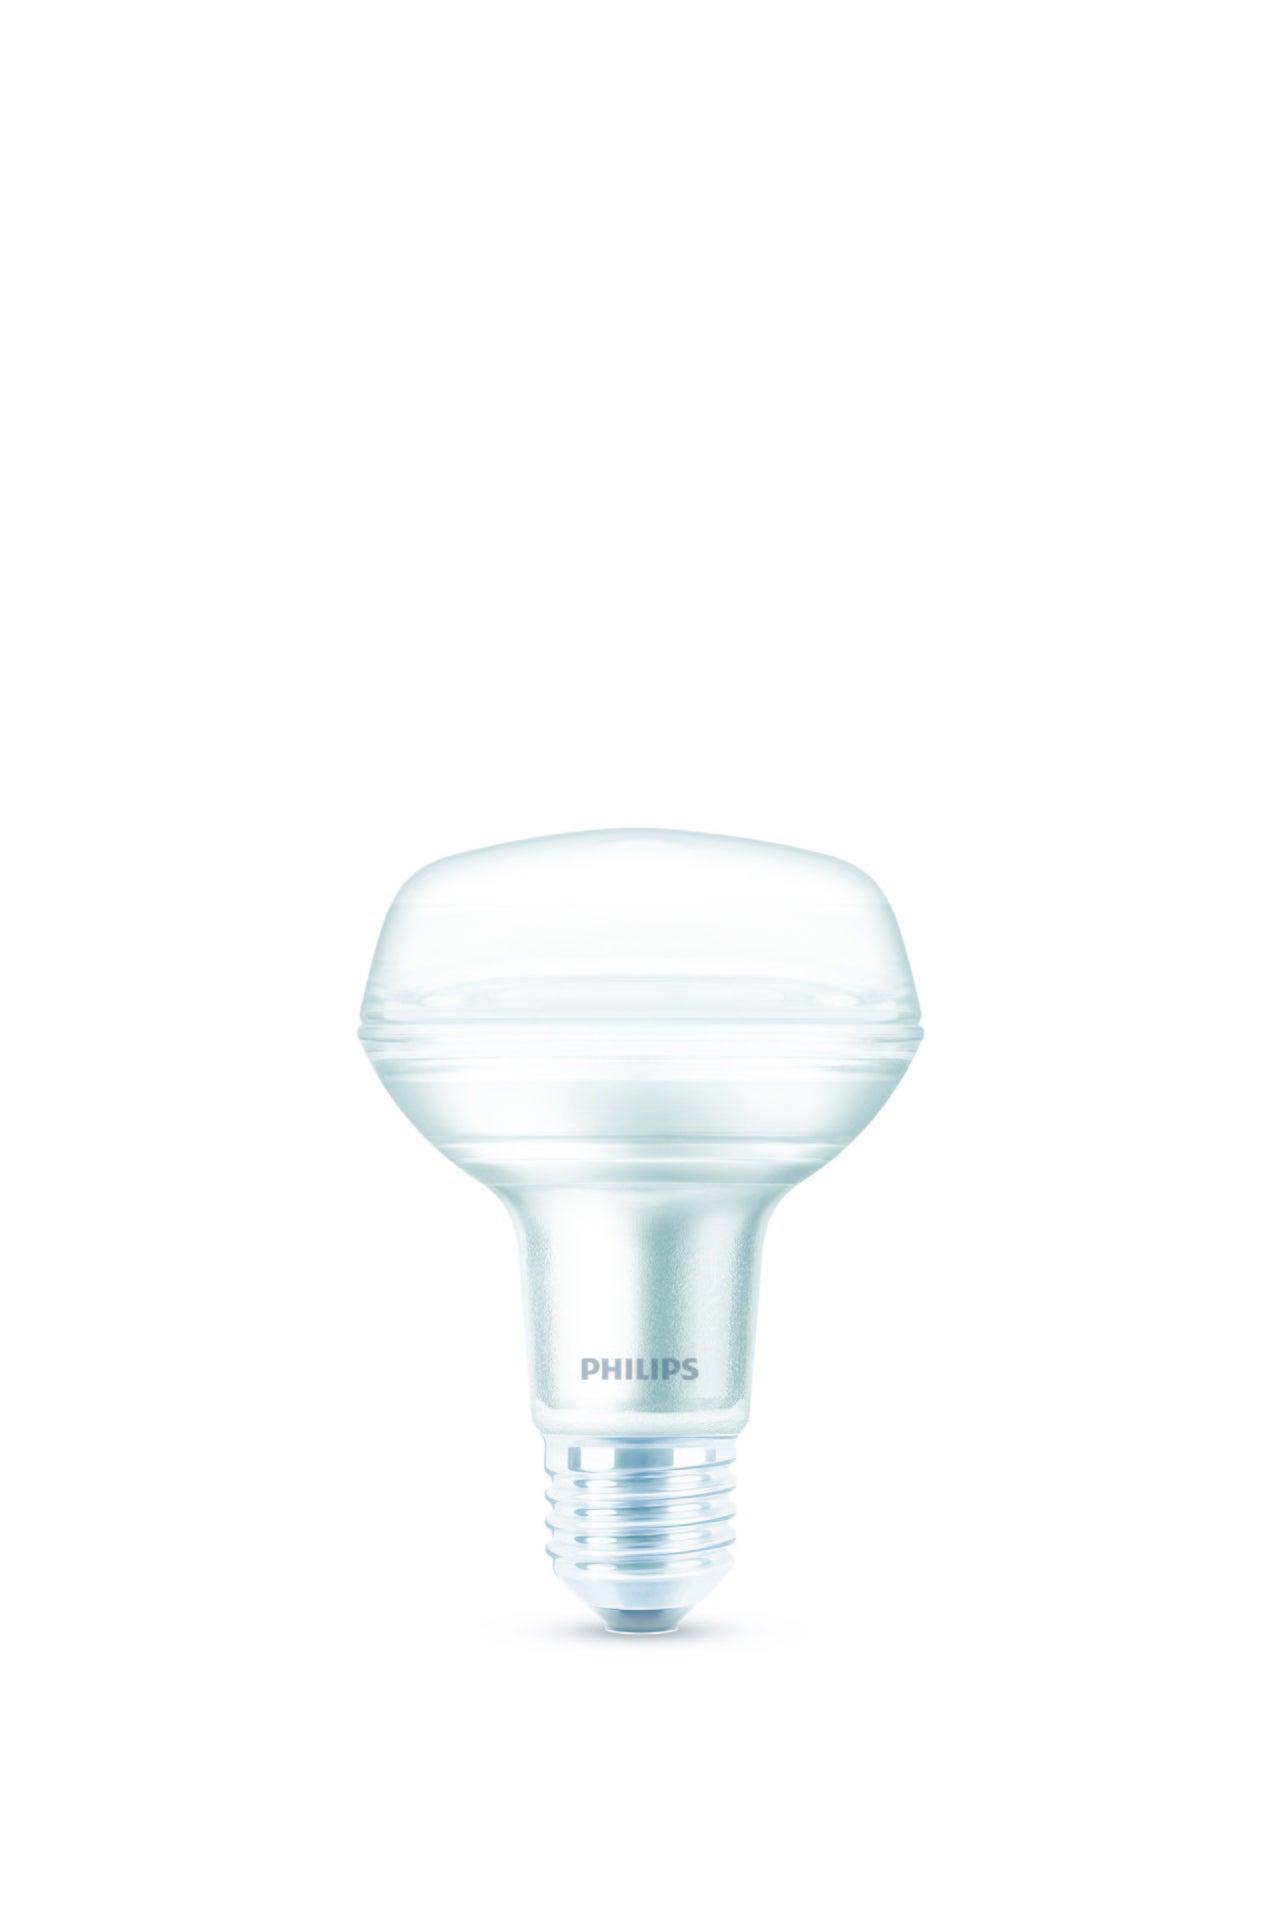 Ampoule Led Opaque Spot E27 345 Lm 4 W Blanc Chaud Philips Leroy Merlin